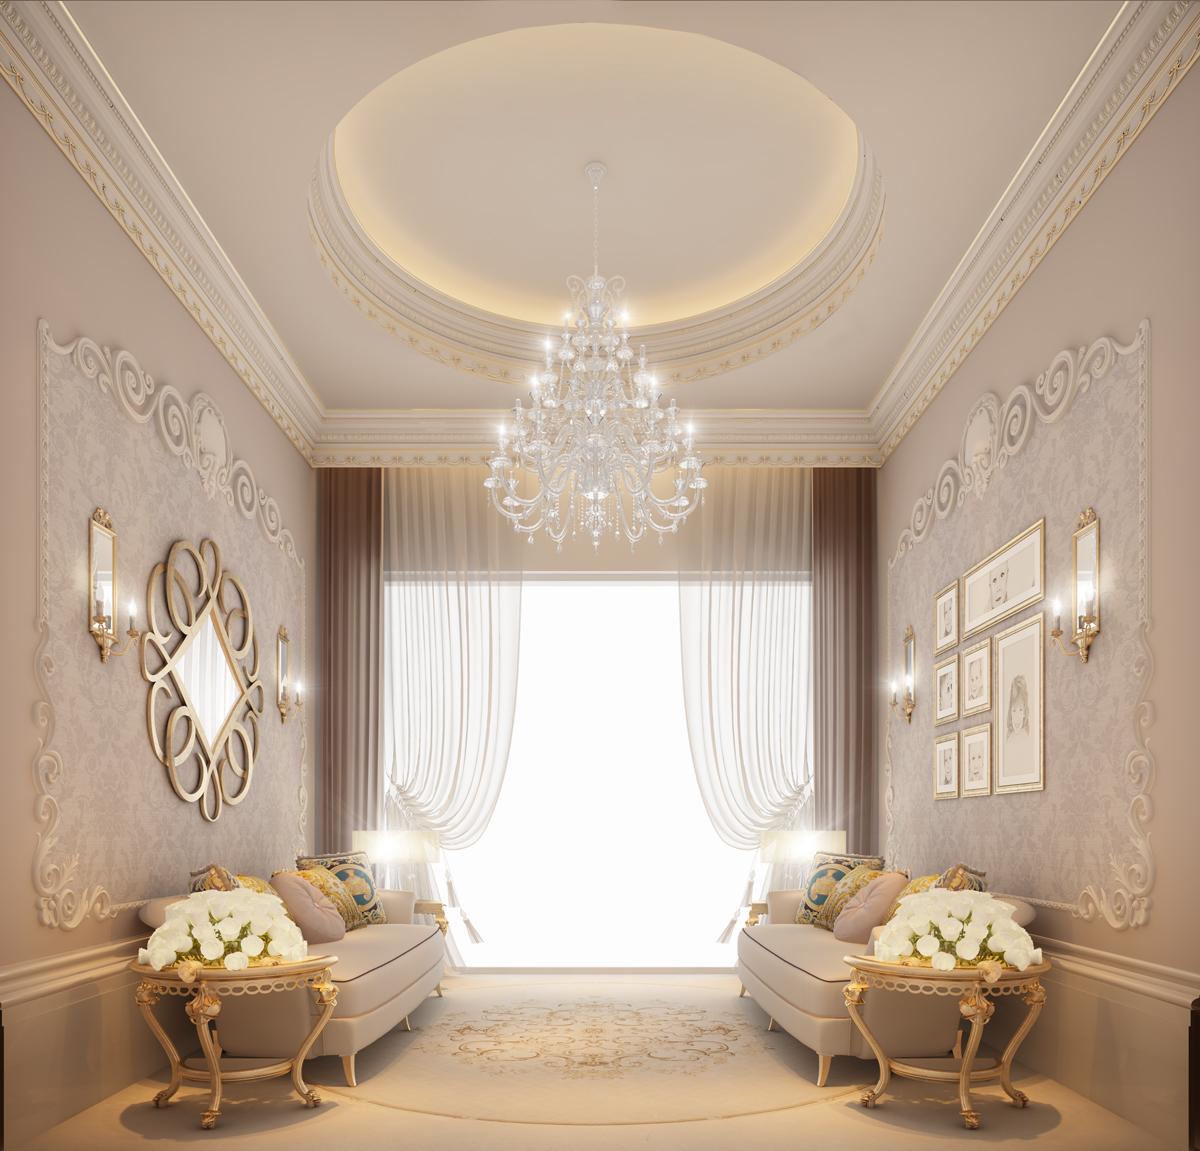 Small Sitting Room Interior Design